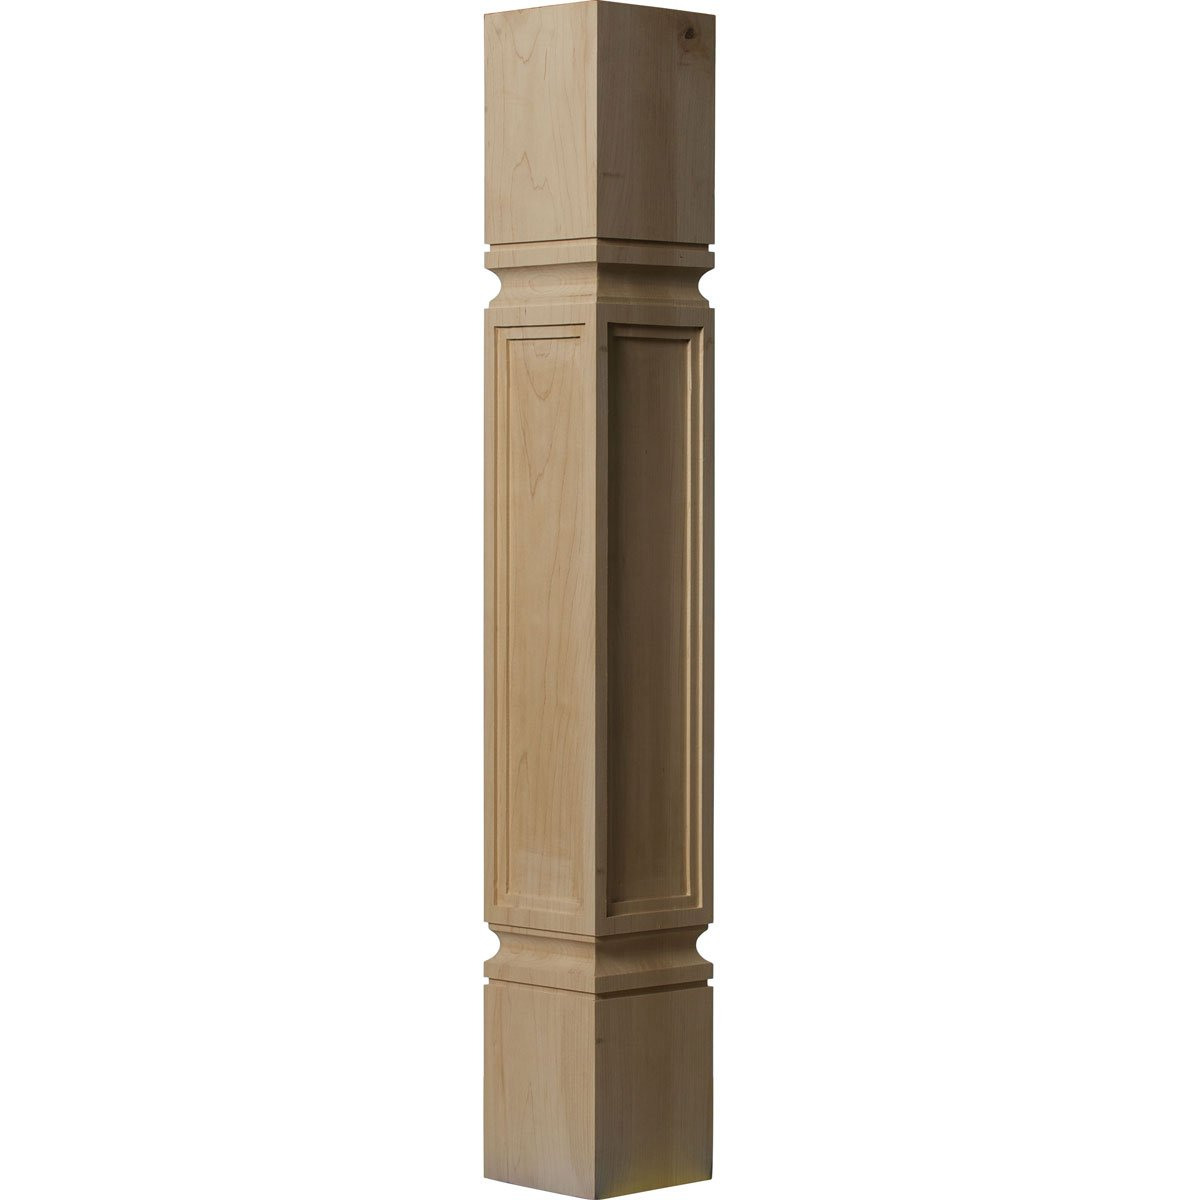 B006ZM1DFI Ekena Millwork COL05X05X35KEAL 5-Inch W x 5-Inch D x 35 1/2-Inch H Kent Raised Panel Cabinet Column, Alder 51iZm8-2rfL